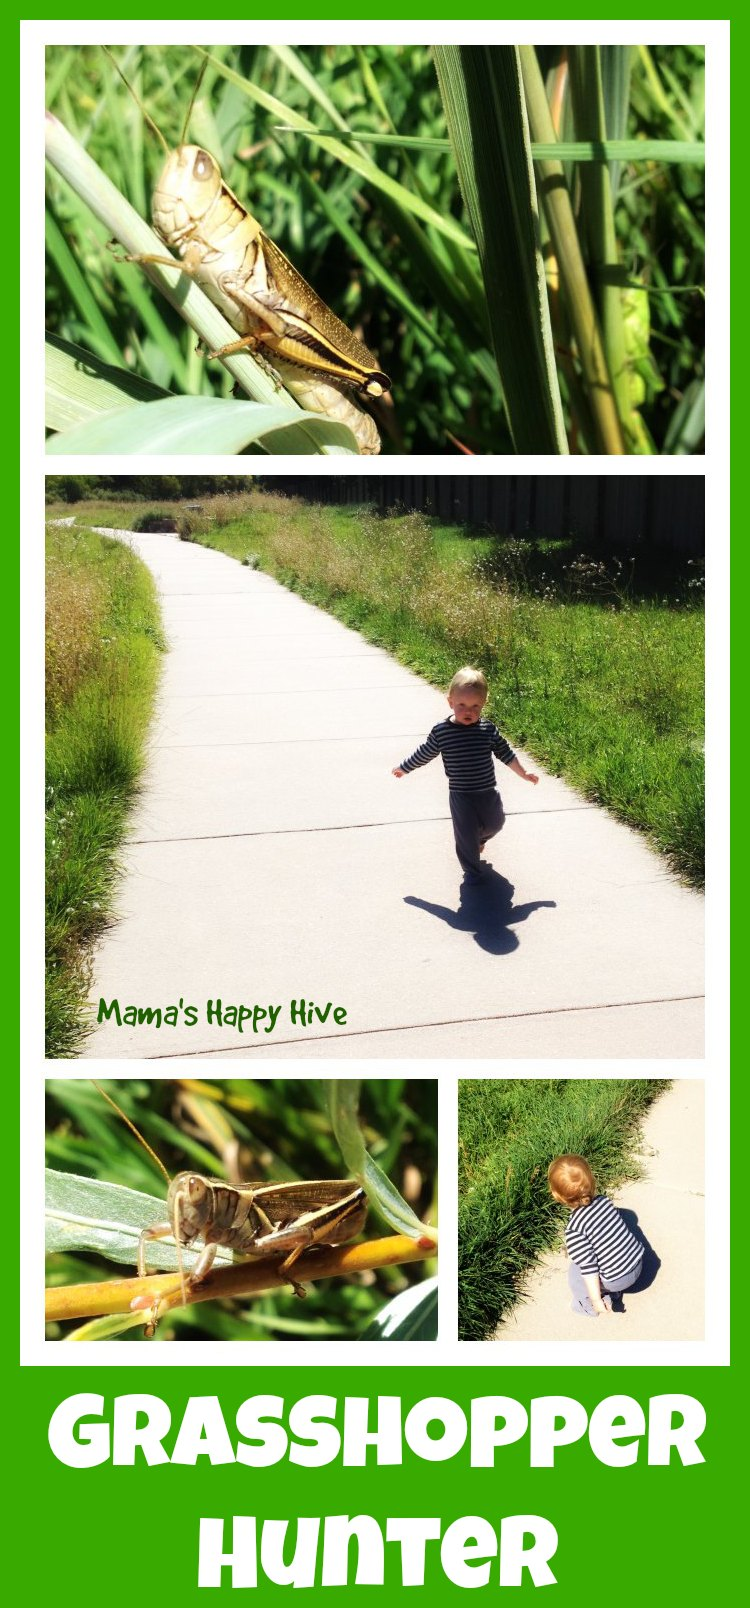 Grasshopper Hunter - www.mamashappyhive.com